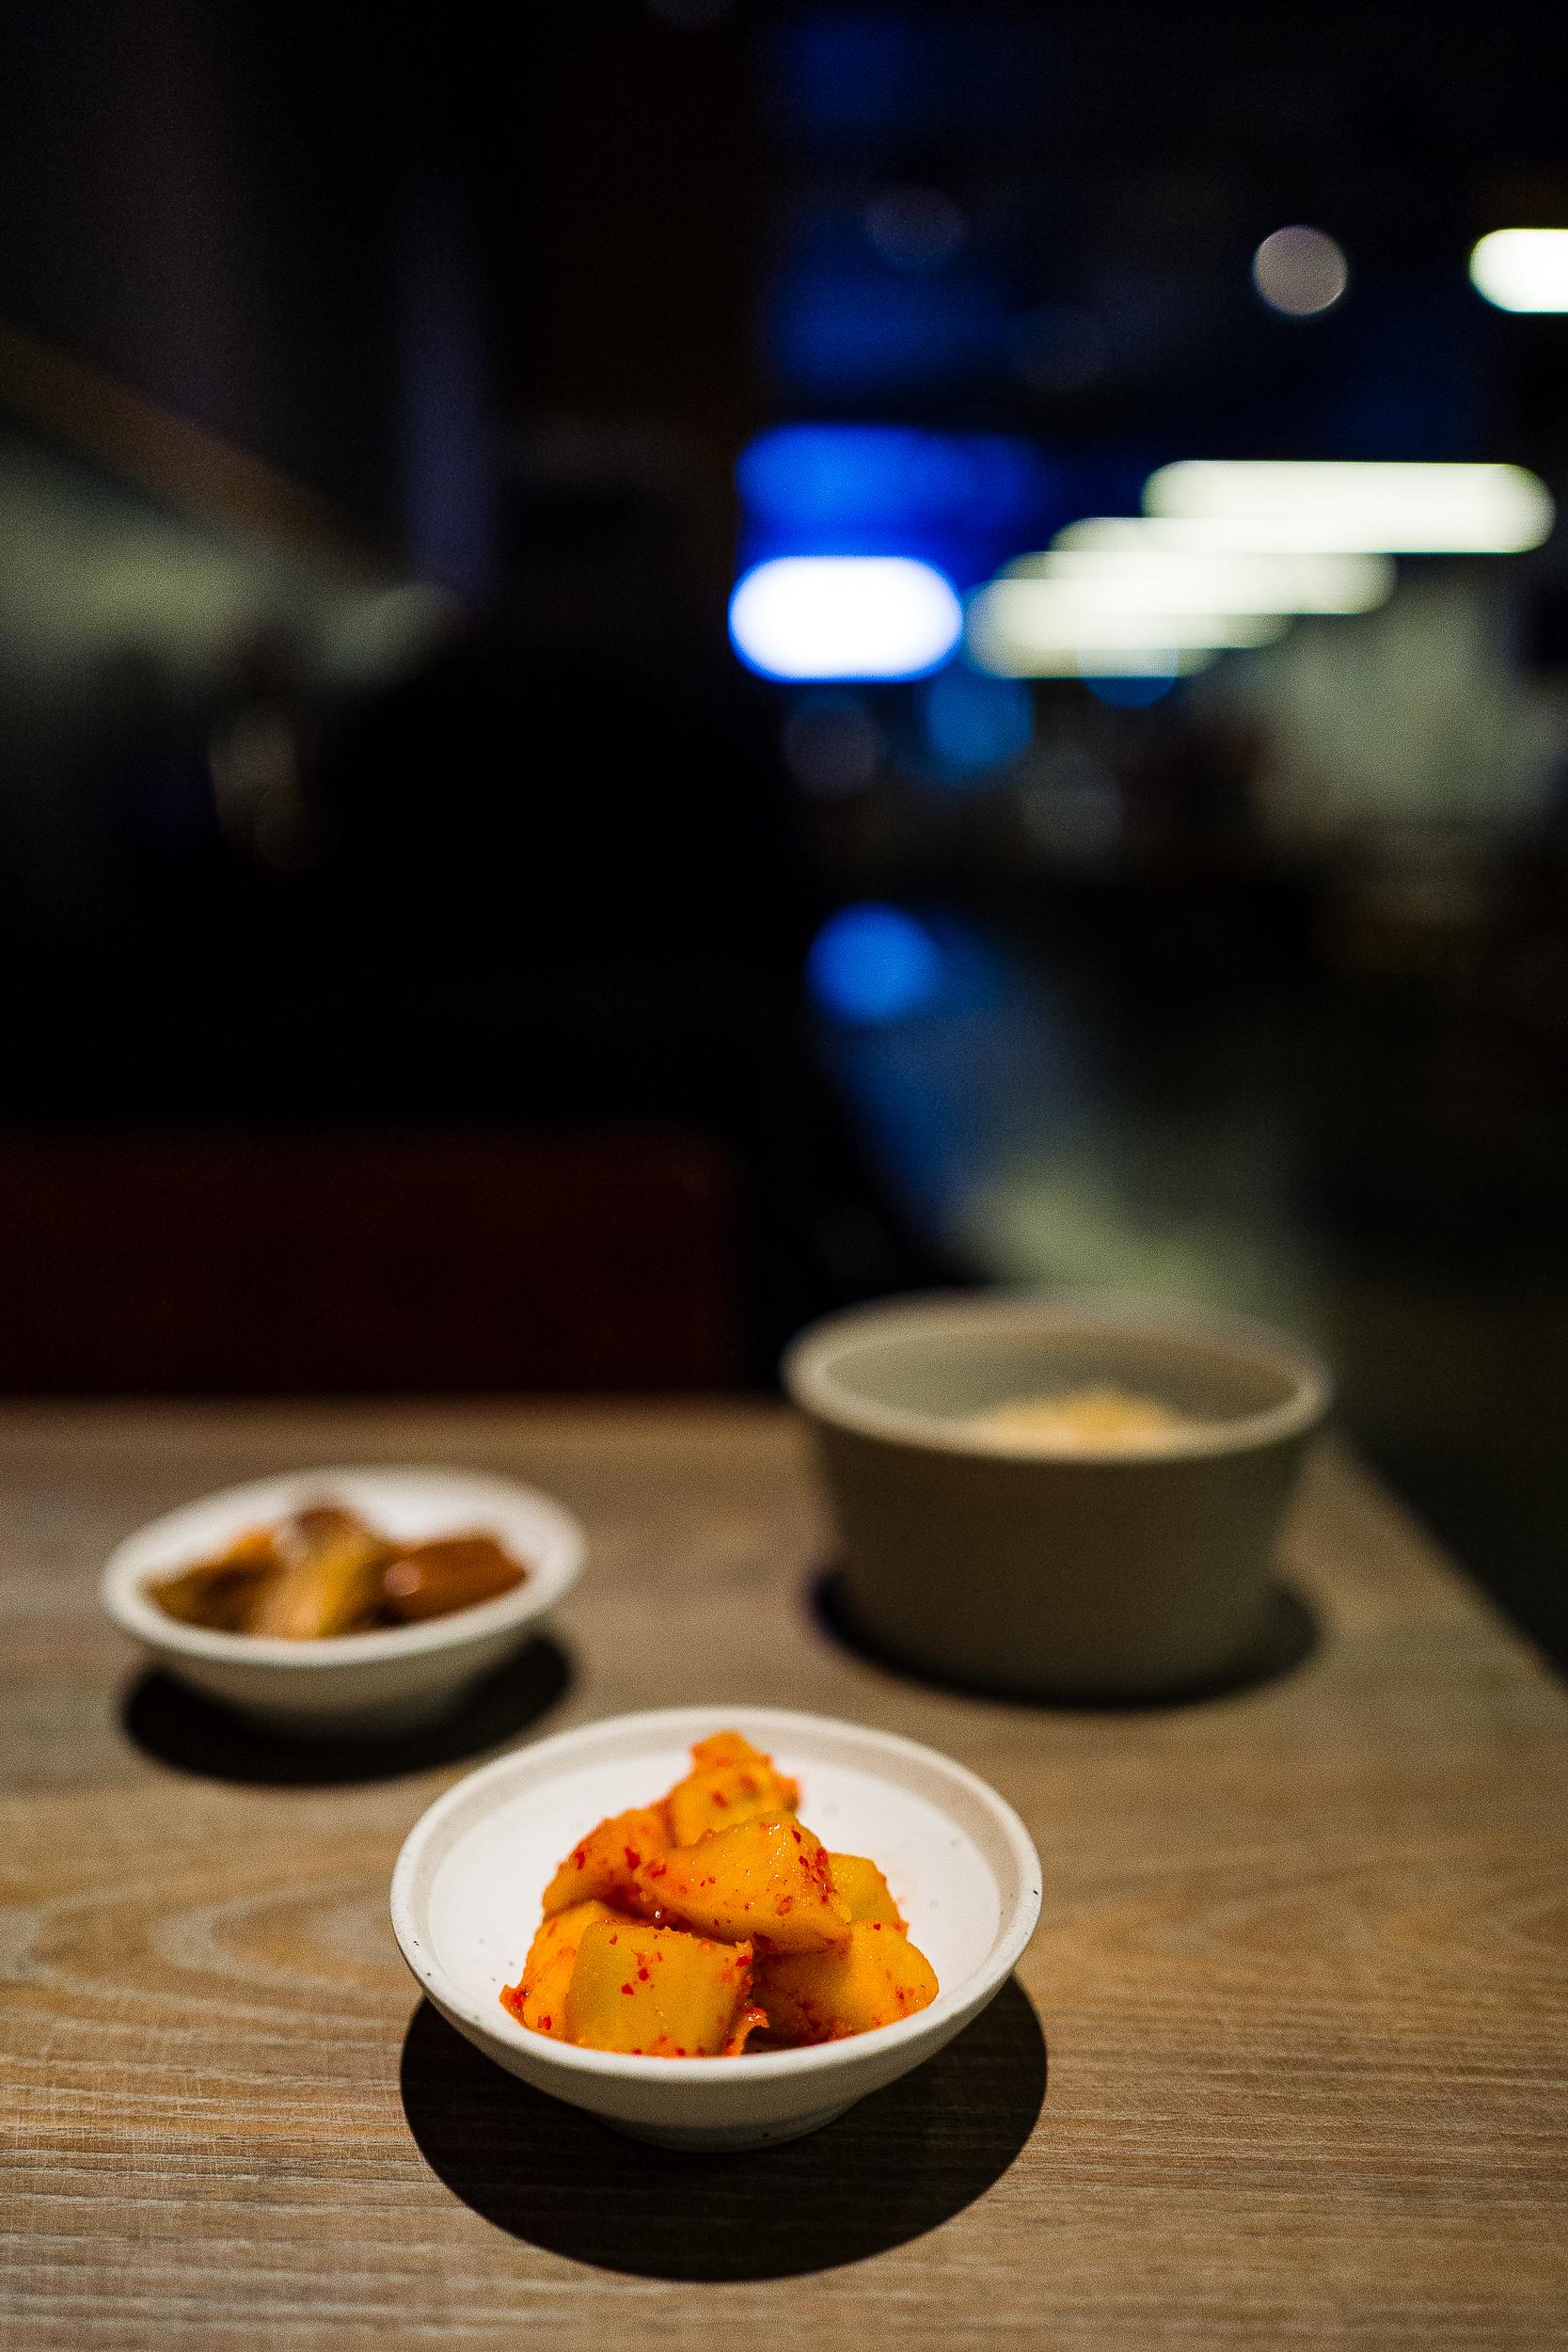 Rice (Upgraded: Shiitake), Apple Kimchi, Eggplant Kimchi #squadgoals